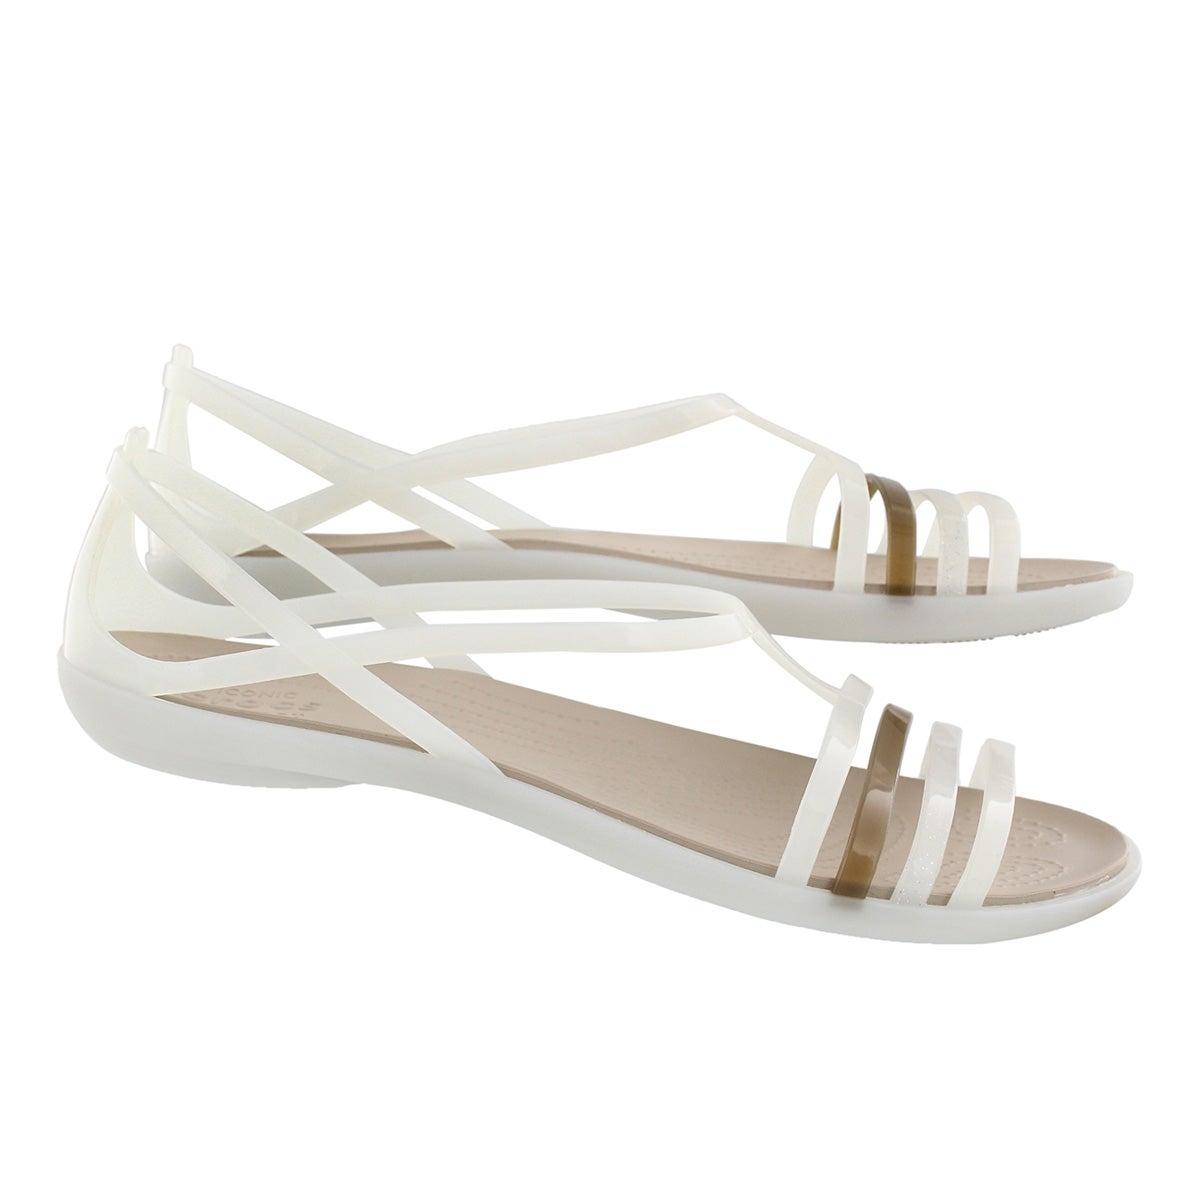 Lds Isabella oyster/walnut sandal